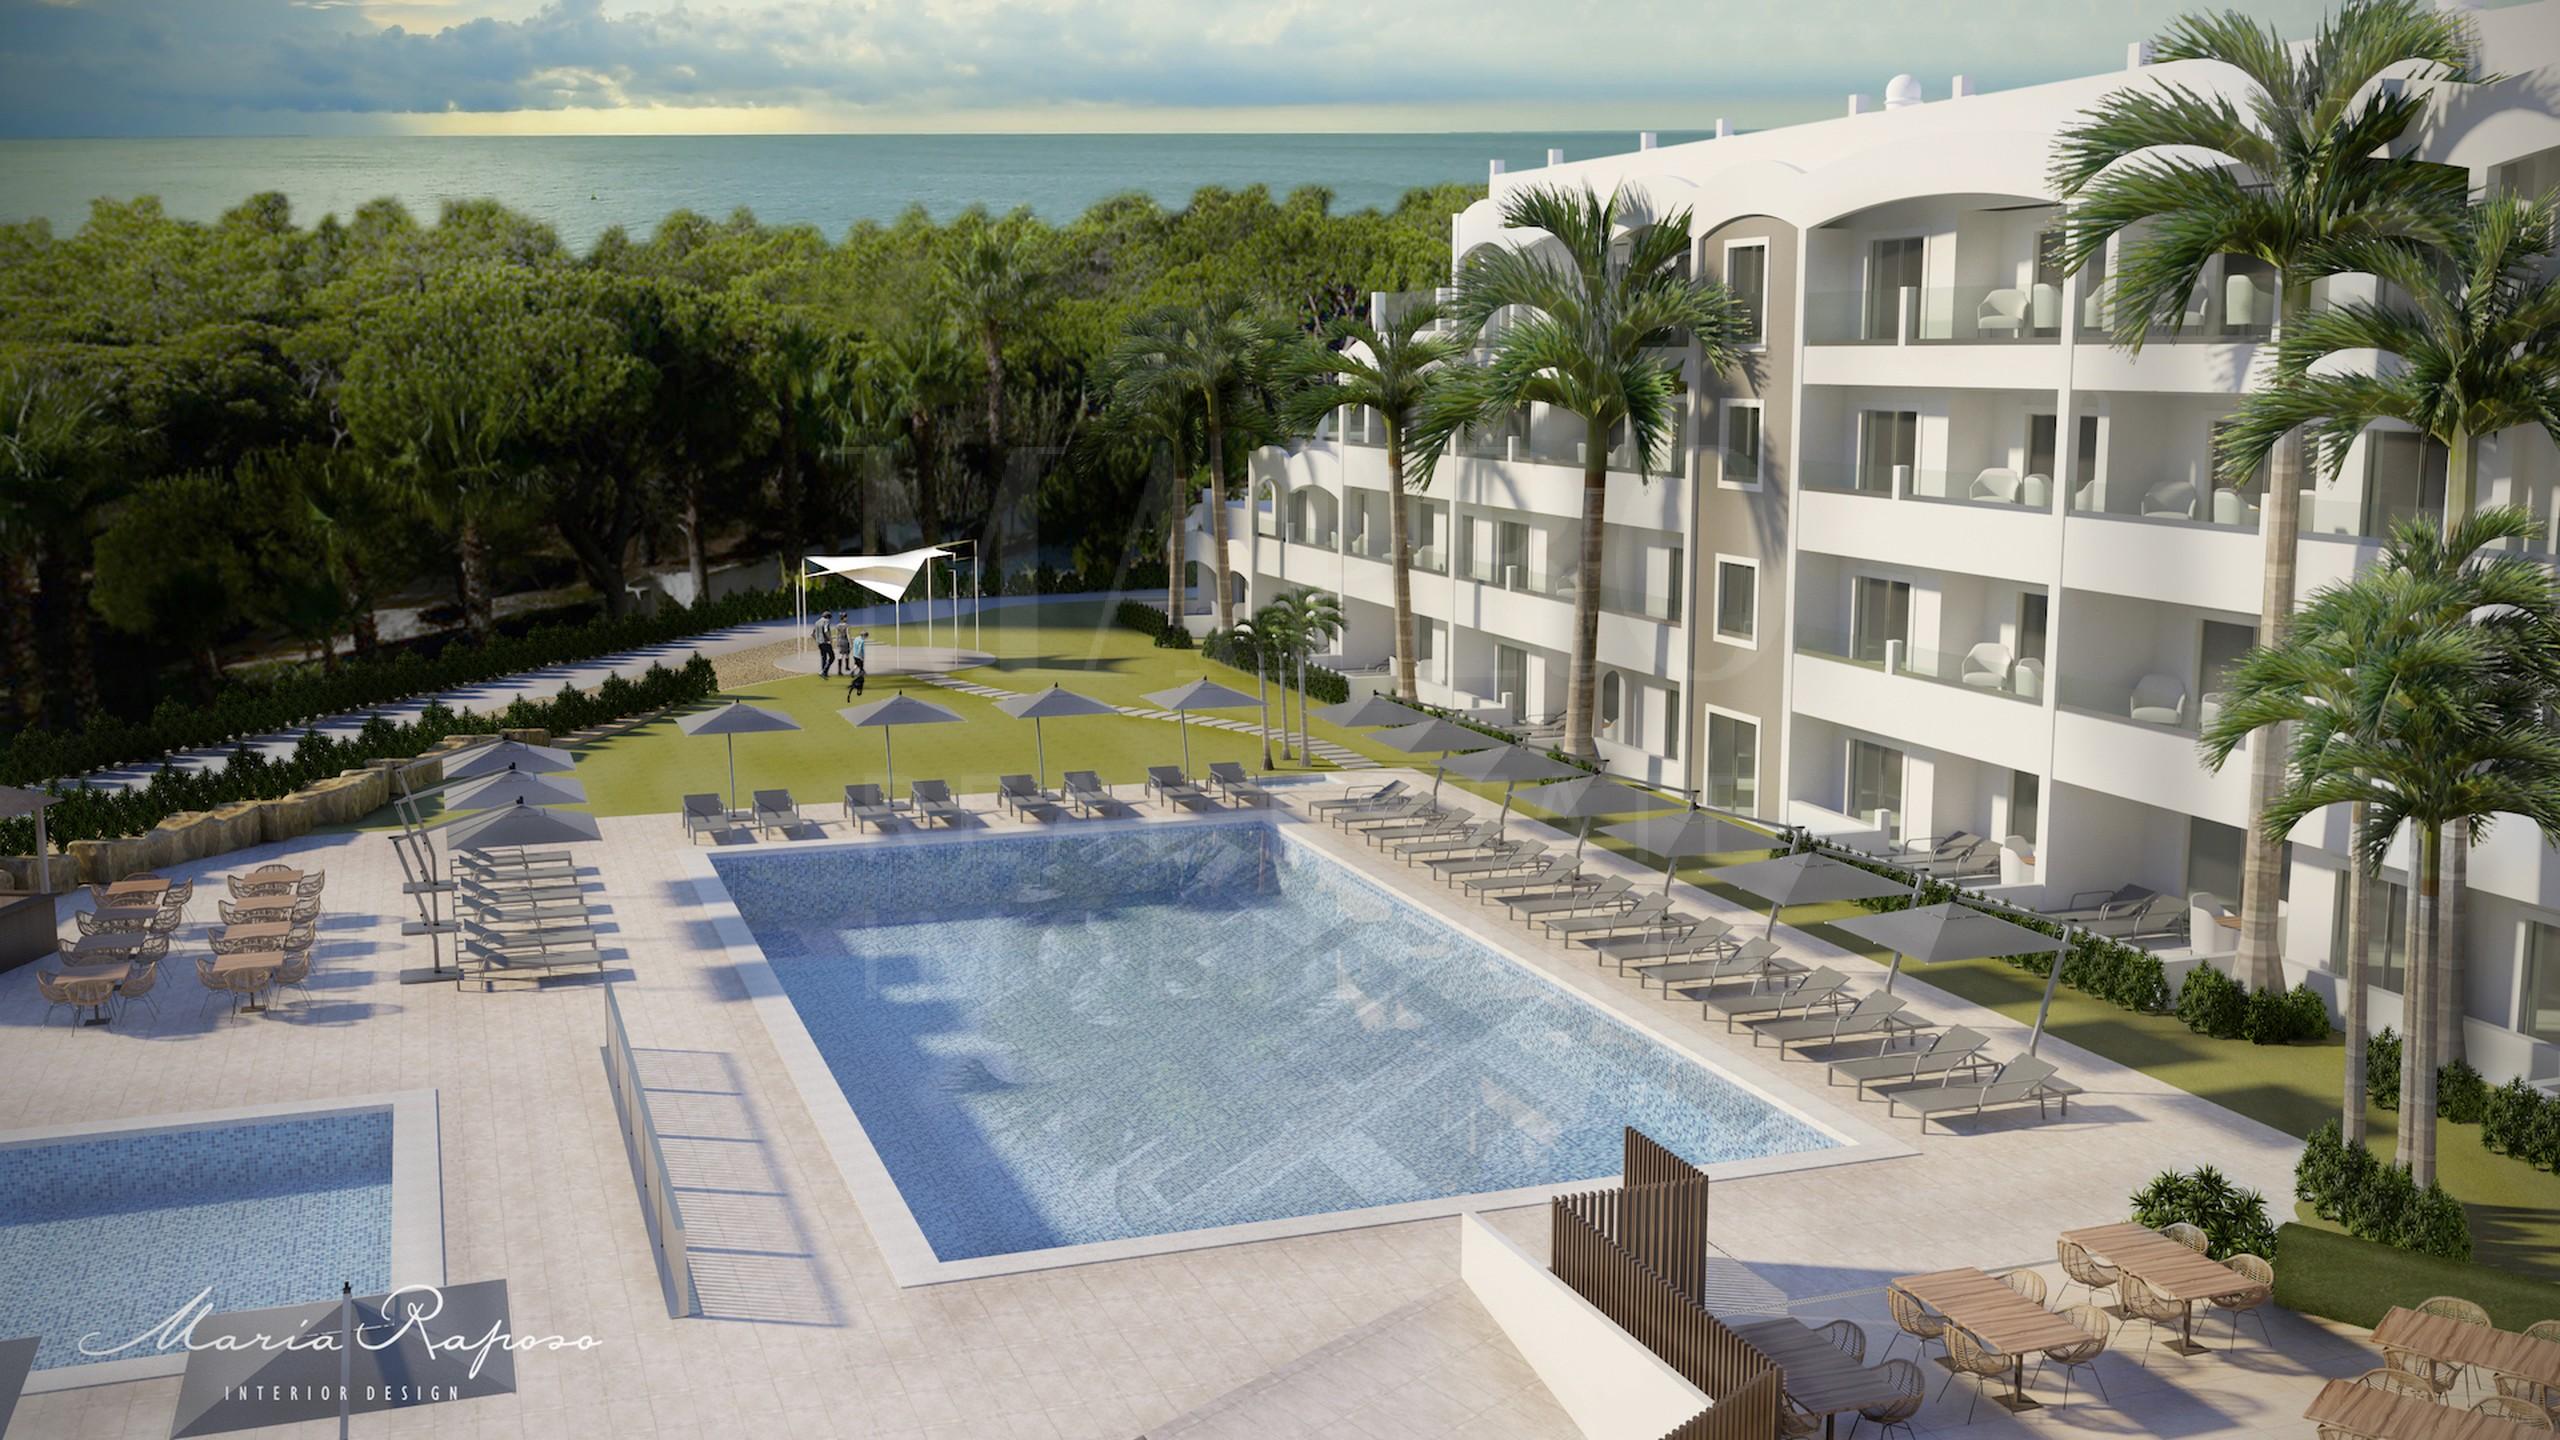 Luxury apartments for sale in Algarve